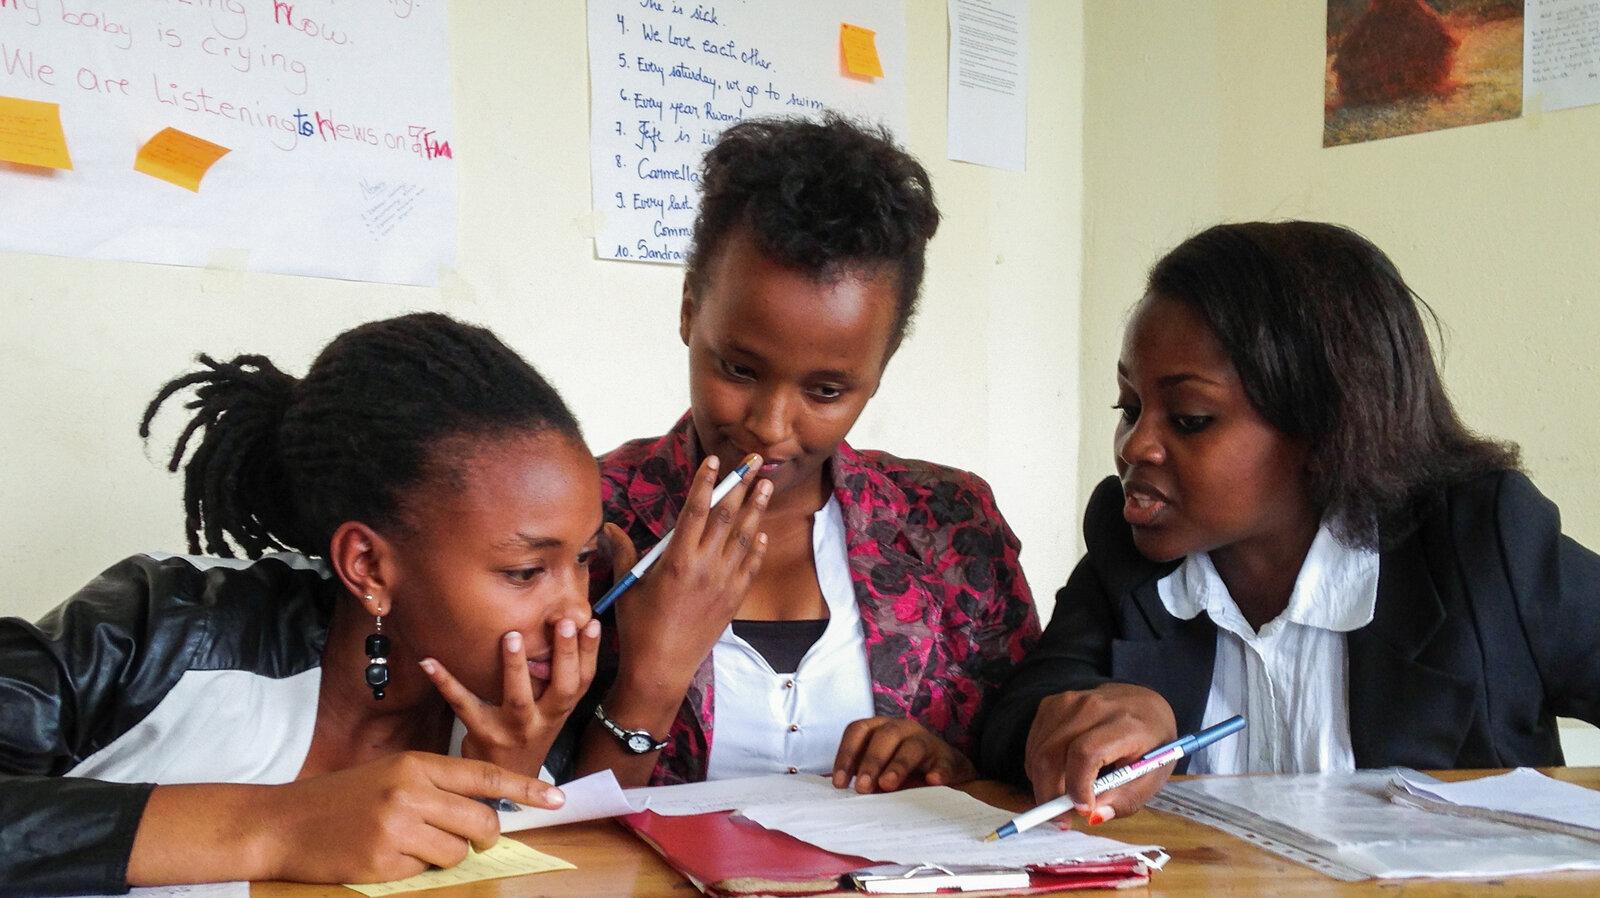 Akilah debate team members (from left) Phylis Kabano, Sonia Rugwiro and Mireille Umutoni Sekamana prepare to compete in a debate tournament.